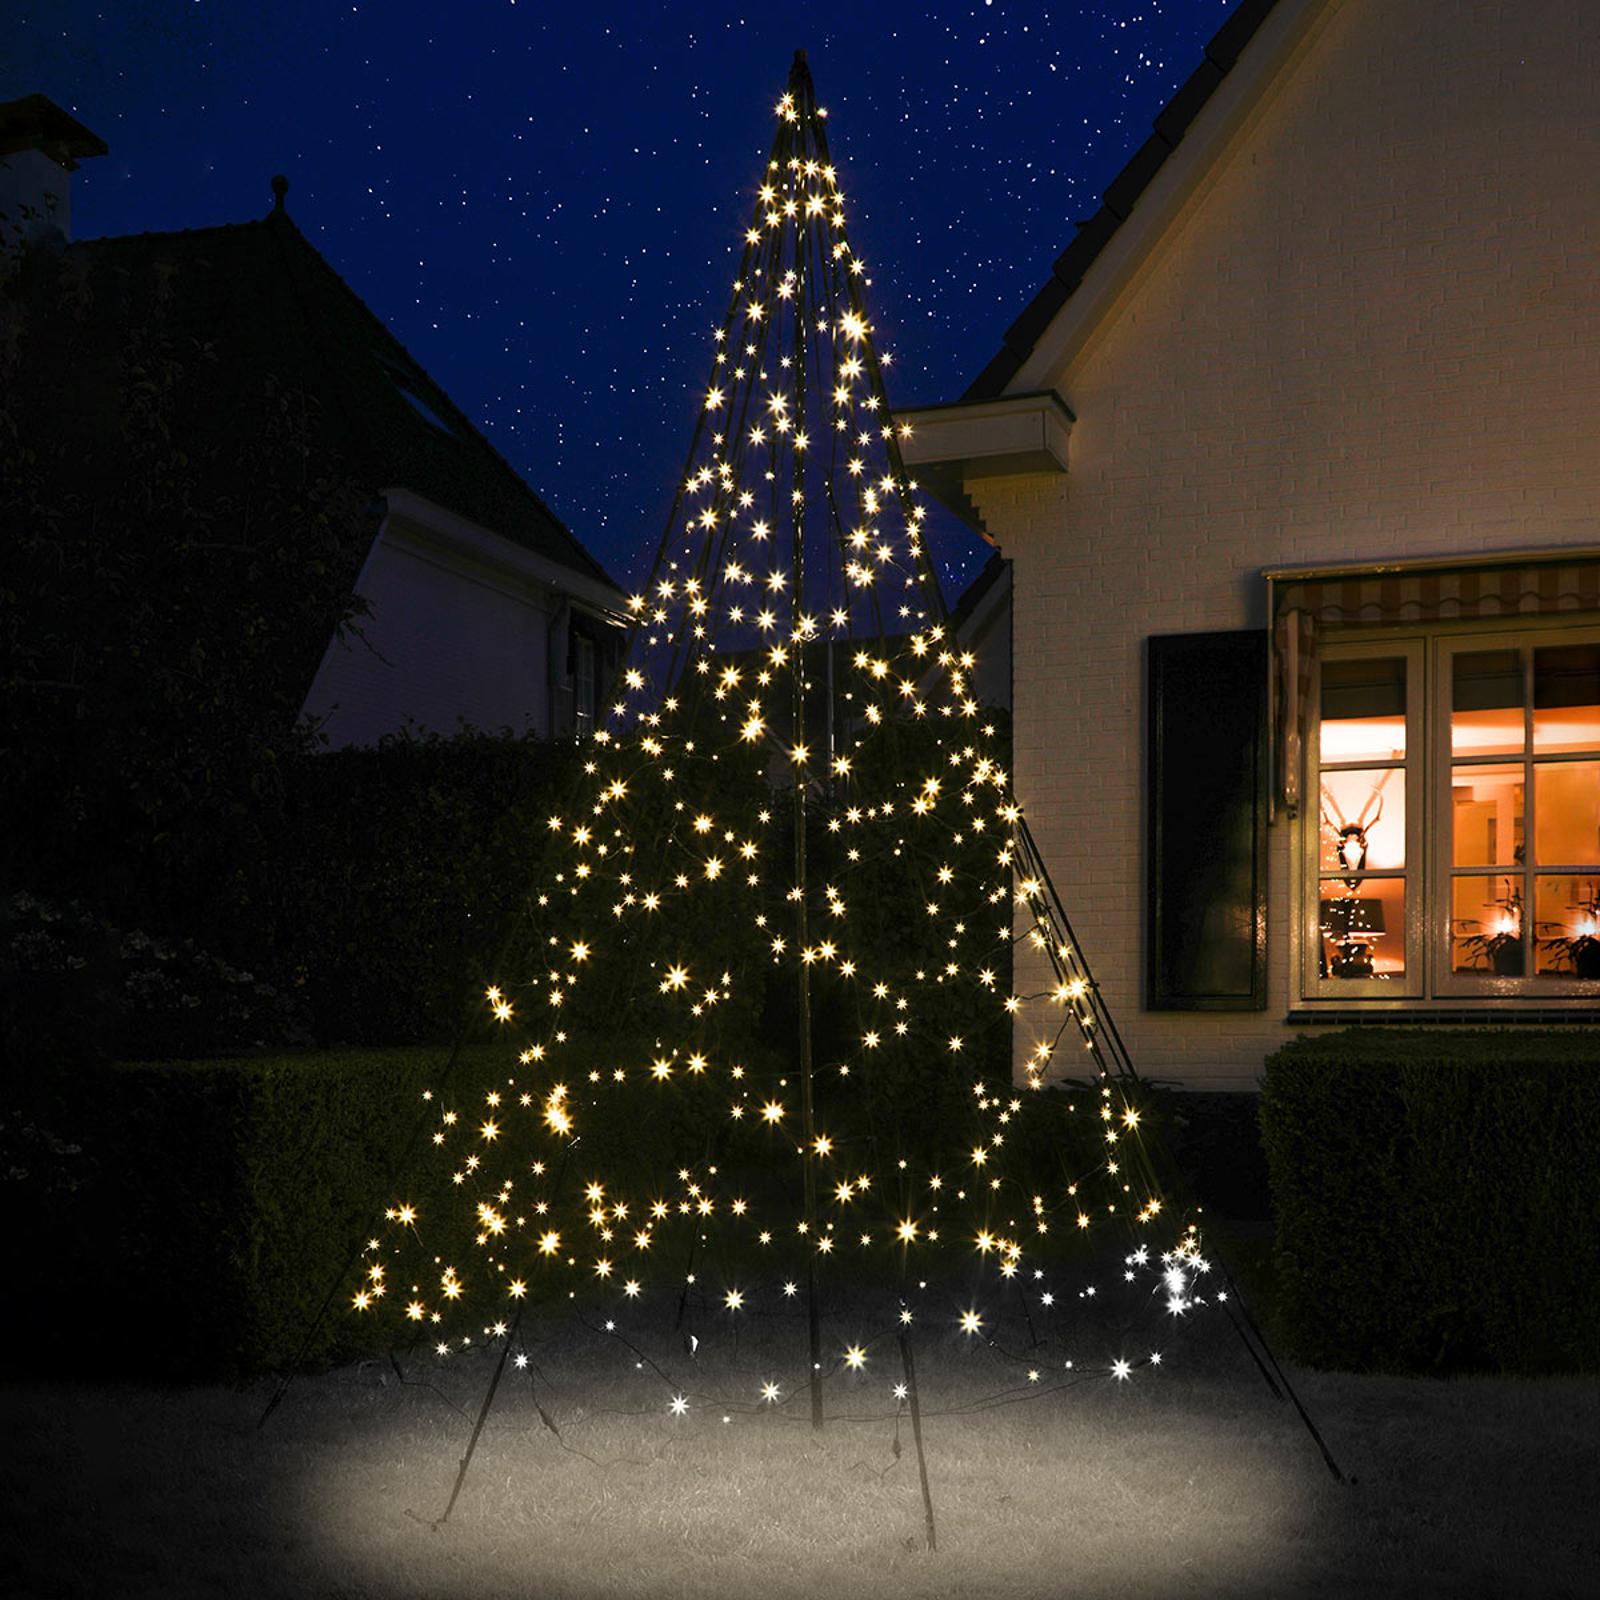 Fairybell® juletræ med midterstang, 3 m, blinkende